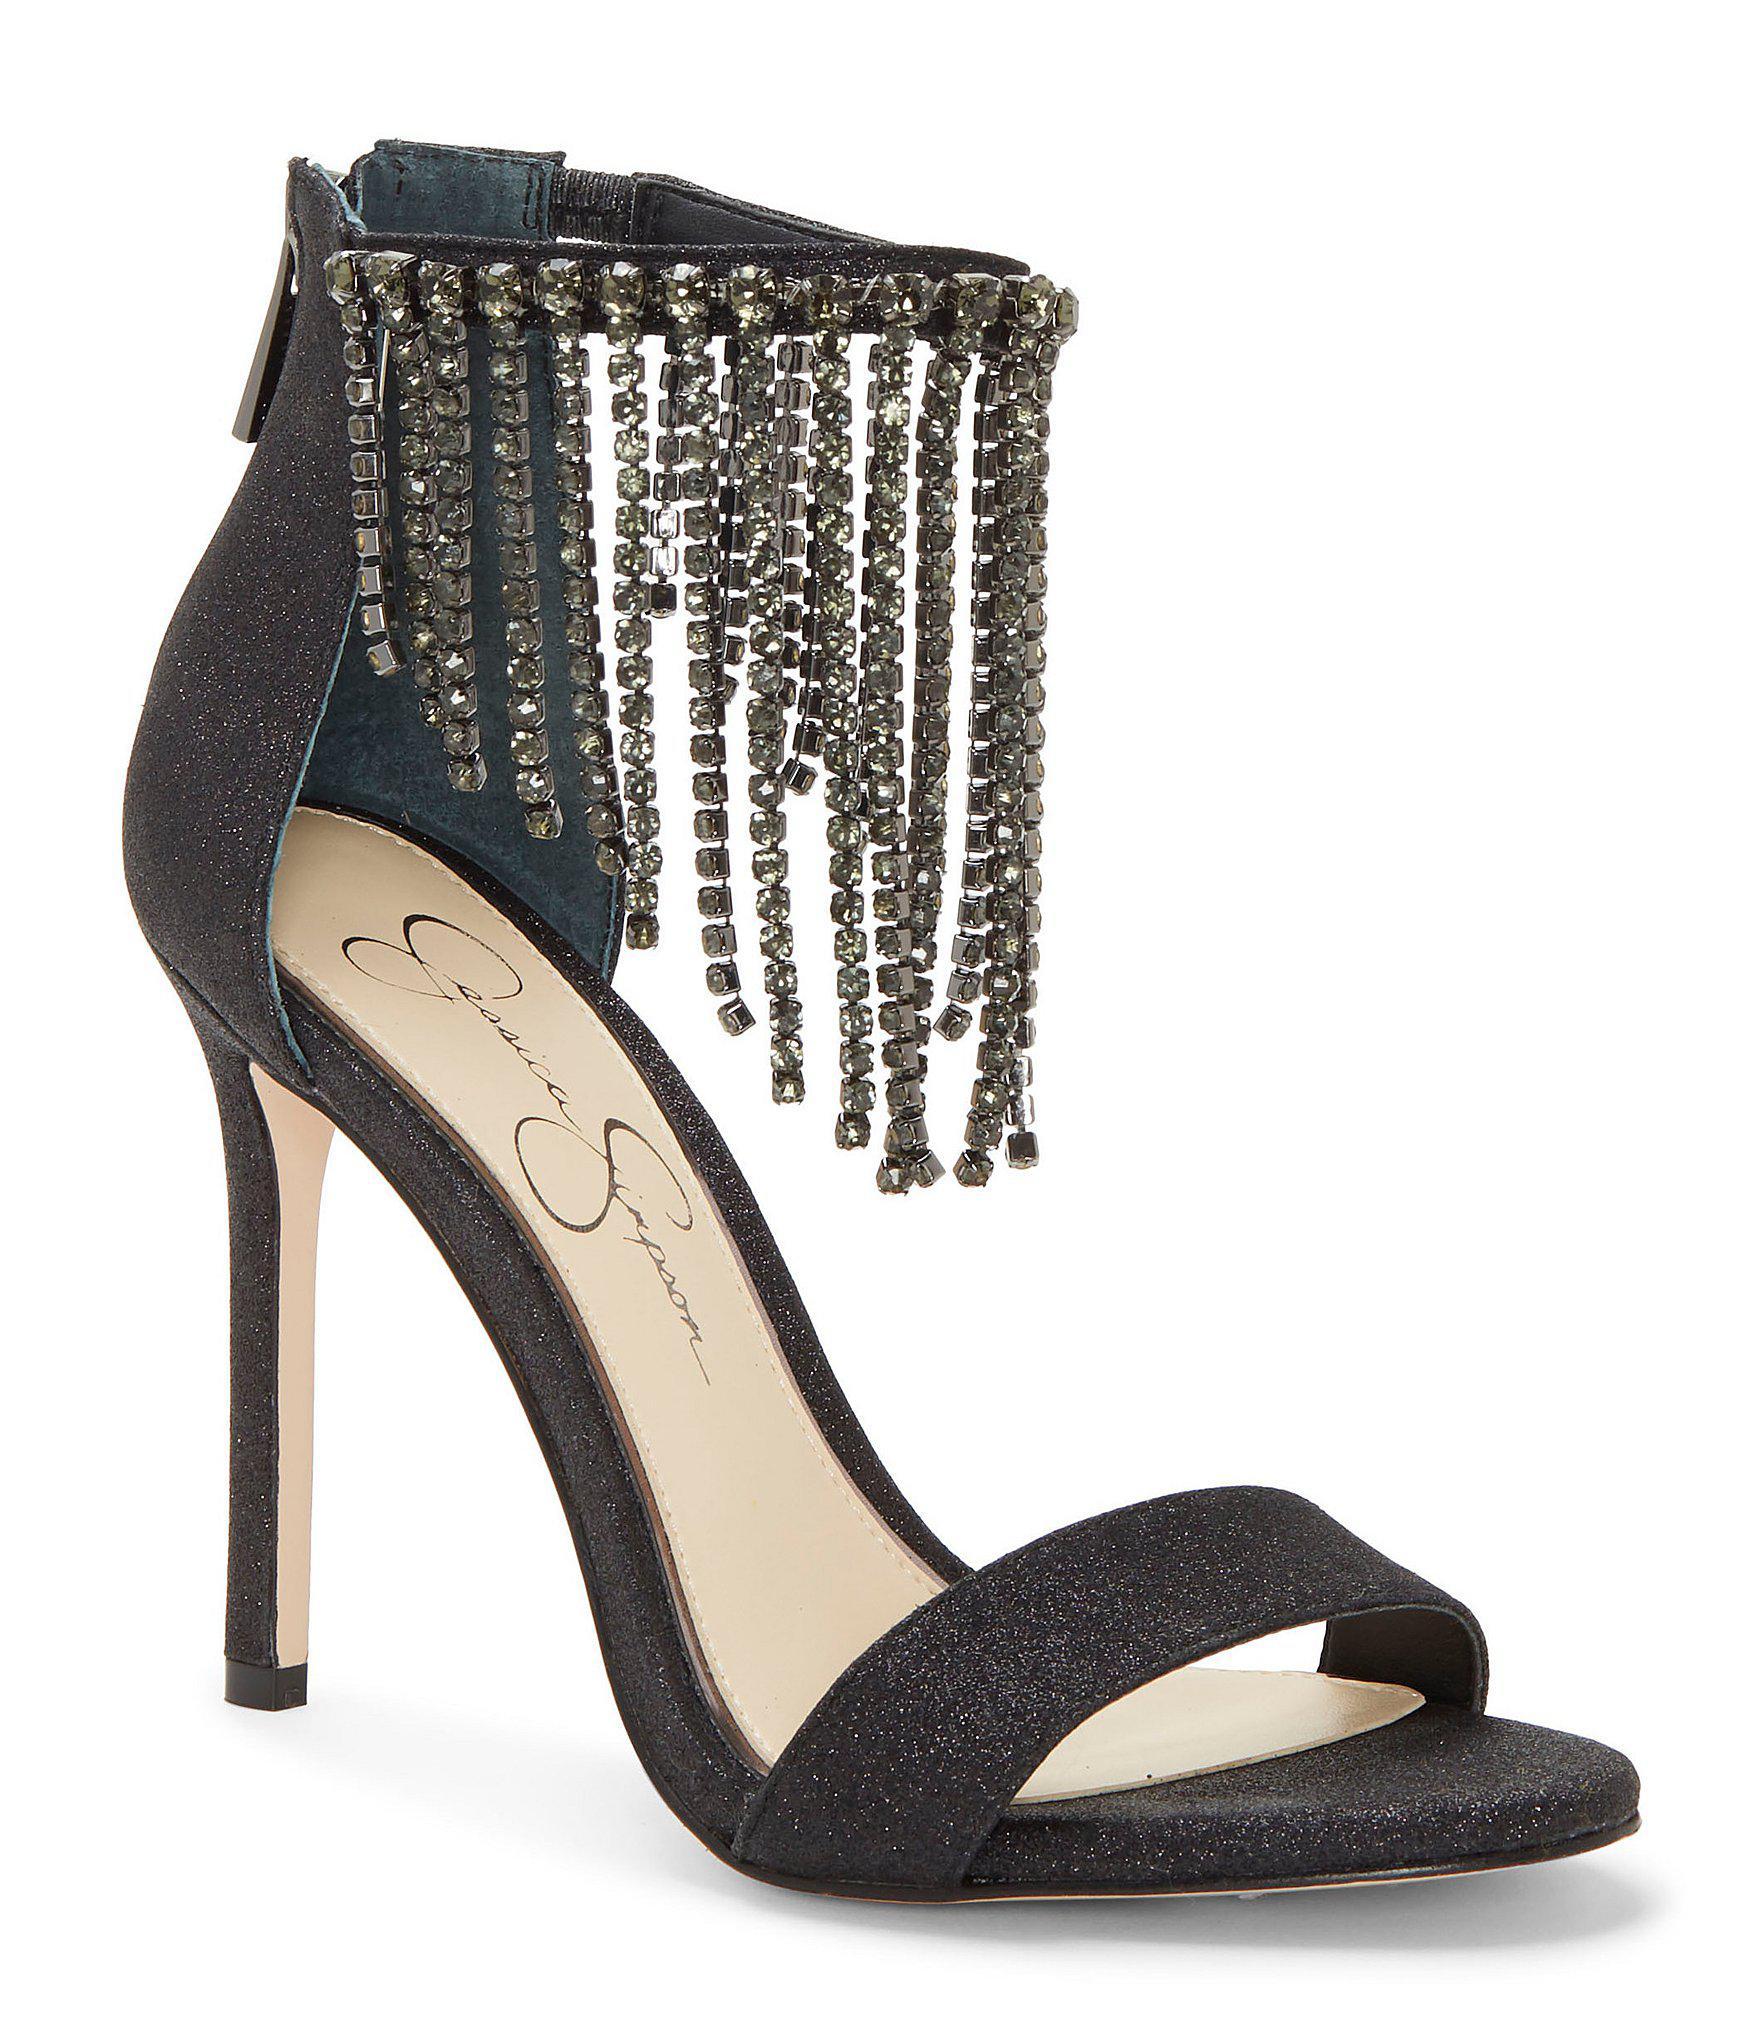 c54e2ec93e4d Lyst - Jessica Simpson Jiena Rhinestone Fringe Dress Sandals in Black